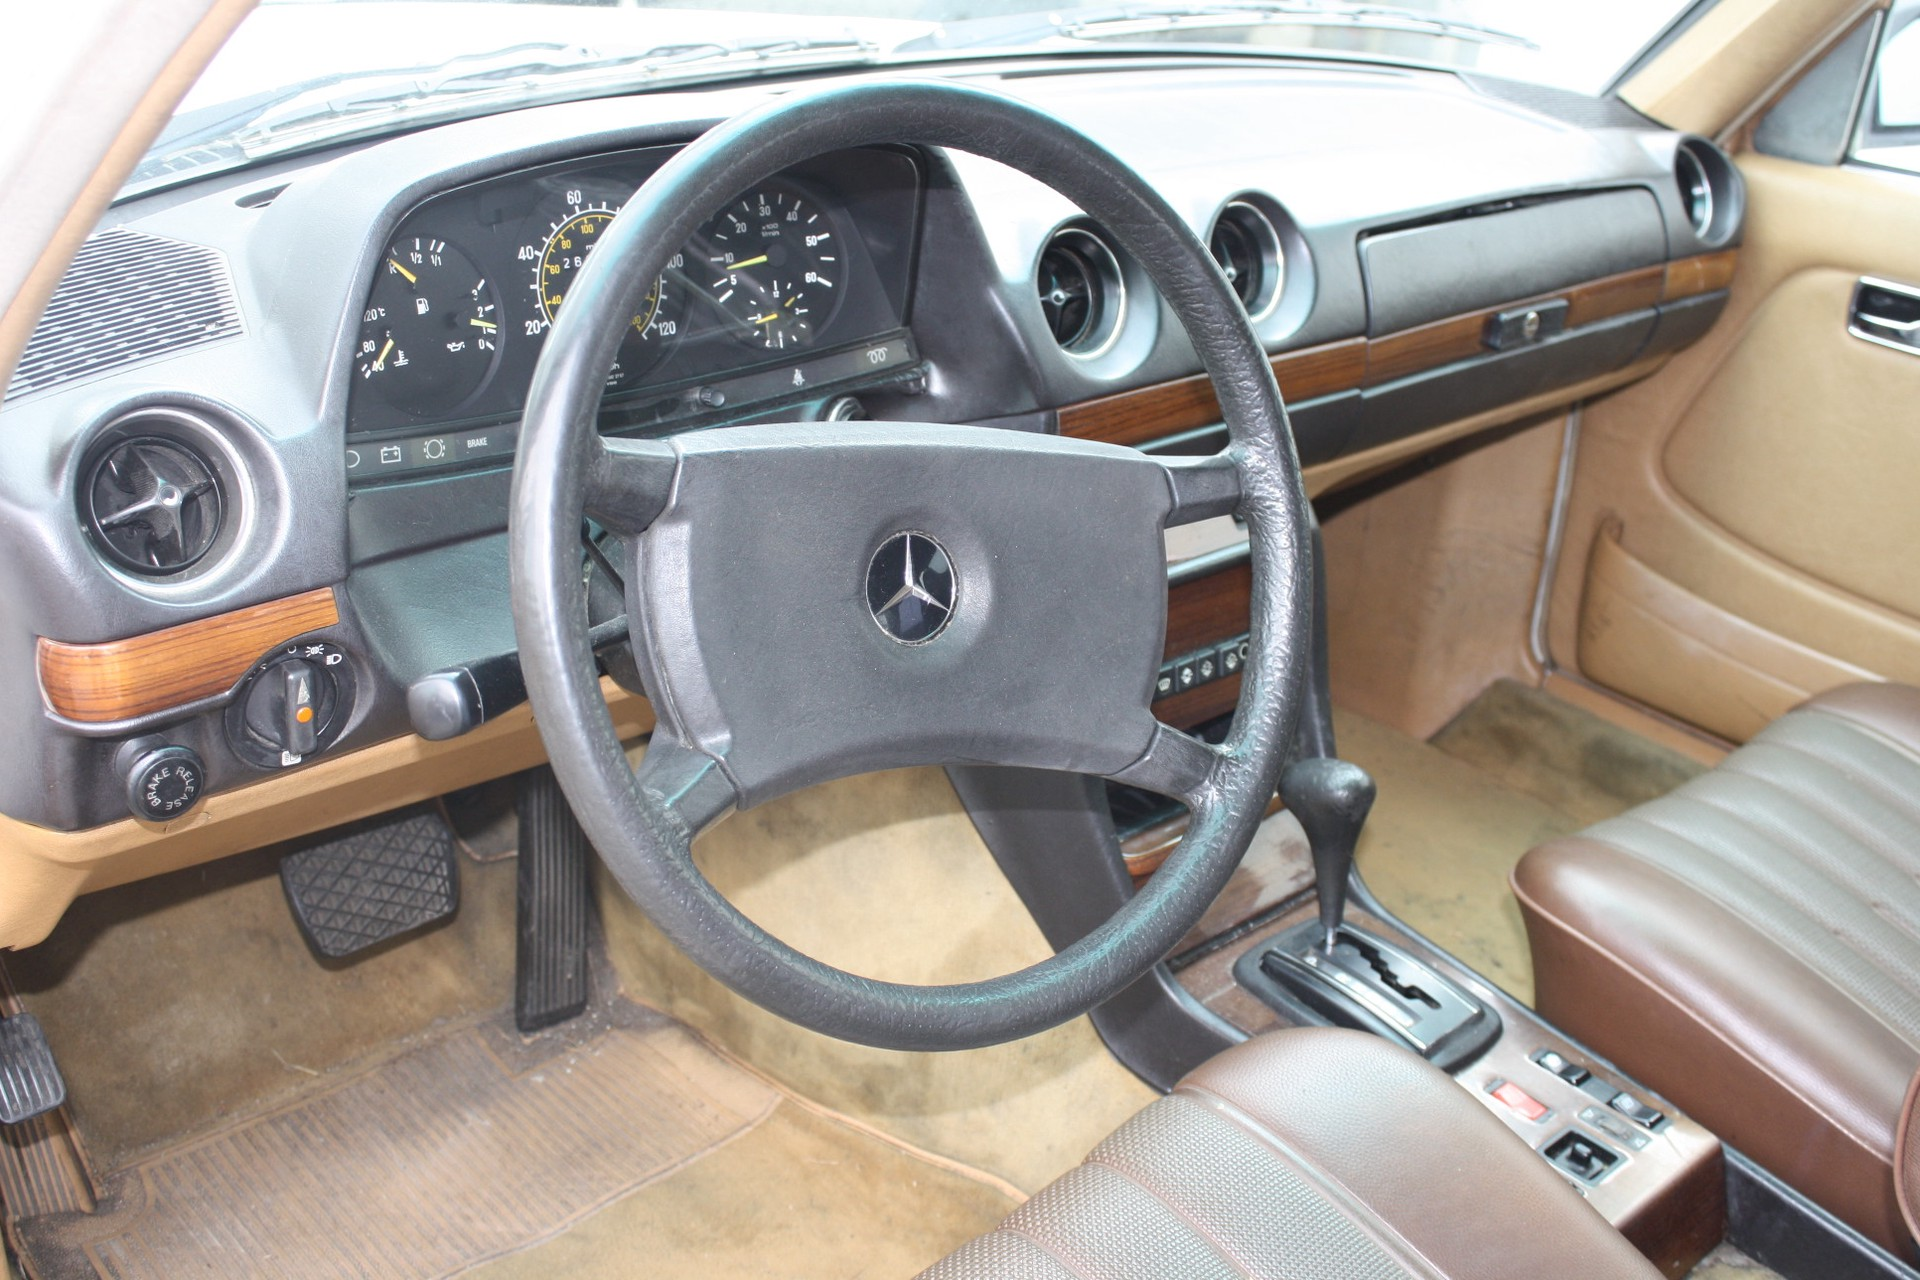 Mercedes-Benz 200-serie 300 TD Turbo diesel Foto 8